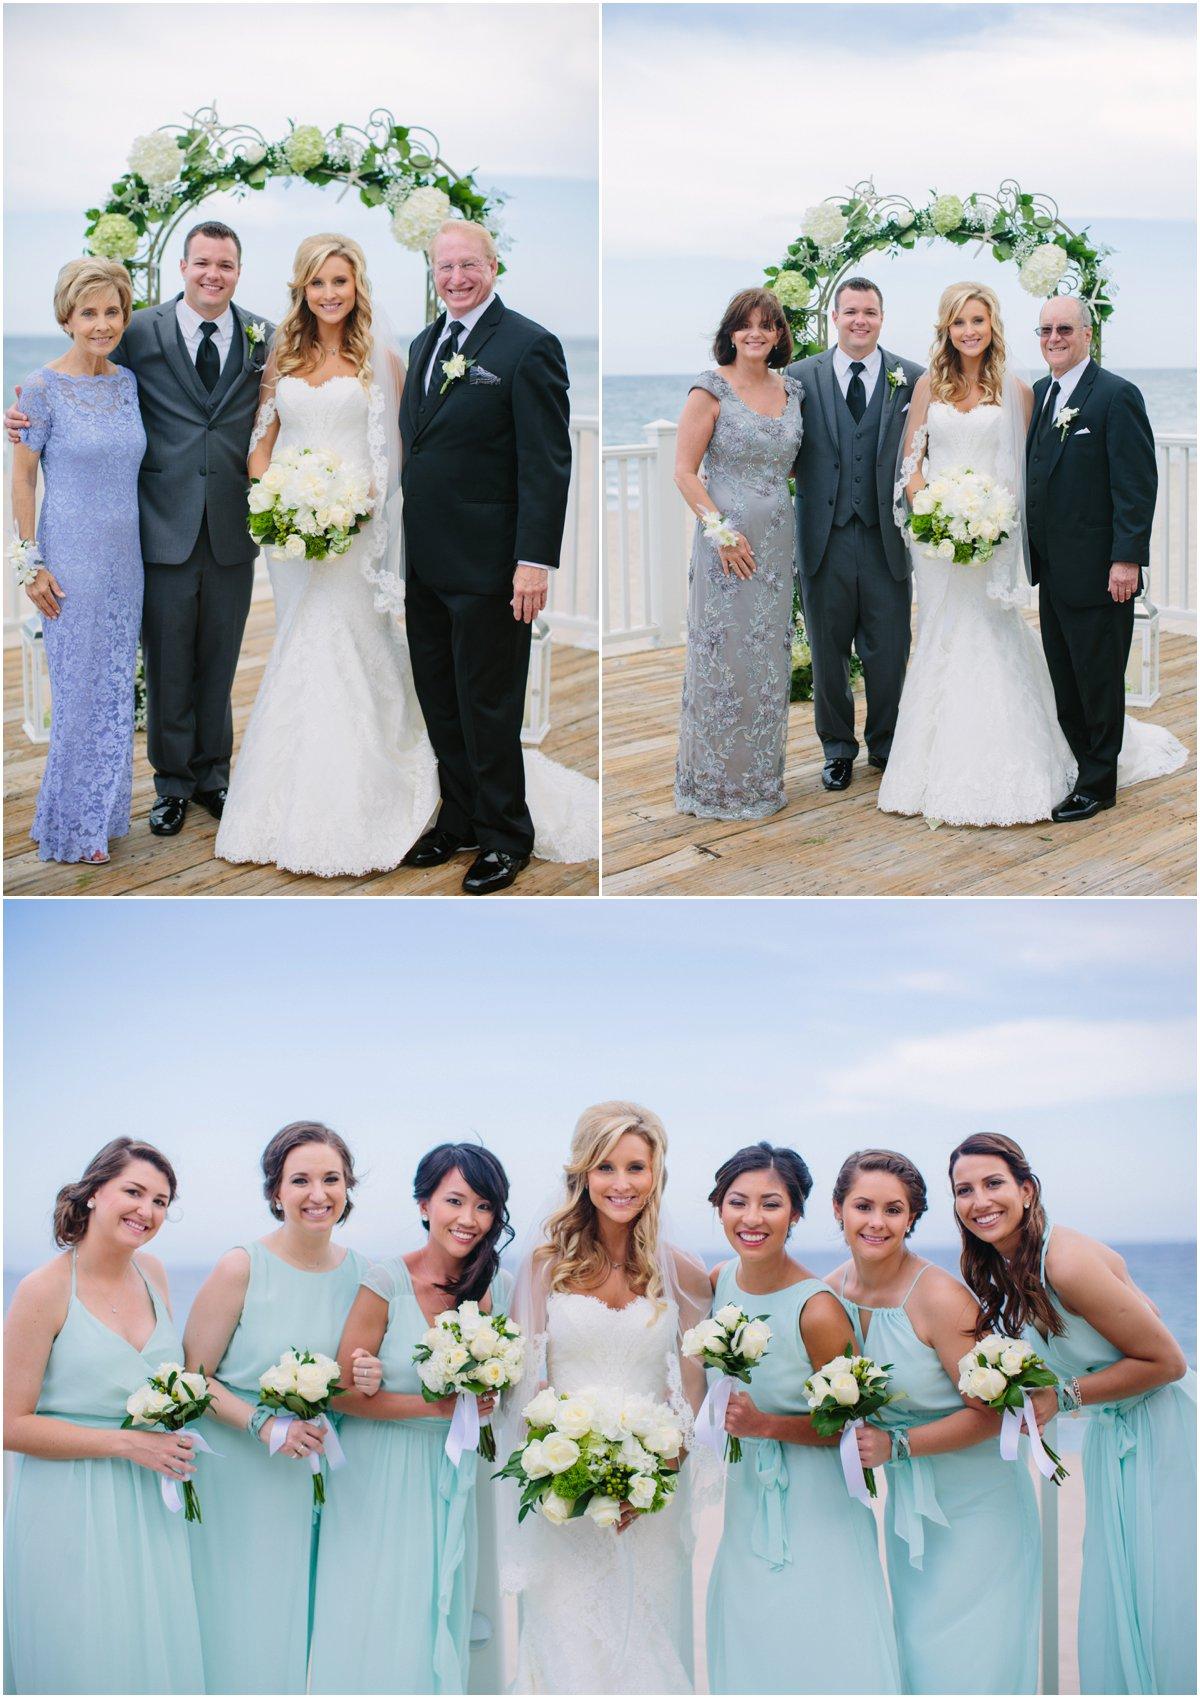 South-Florida-Wedding-Photographer-Hillsboro-lighthouse_0020